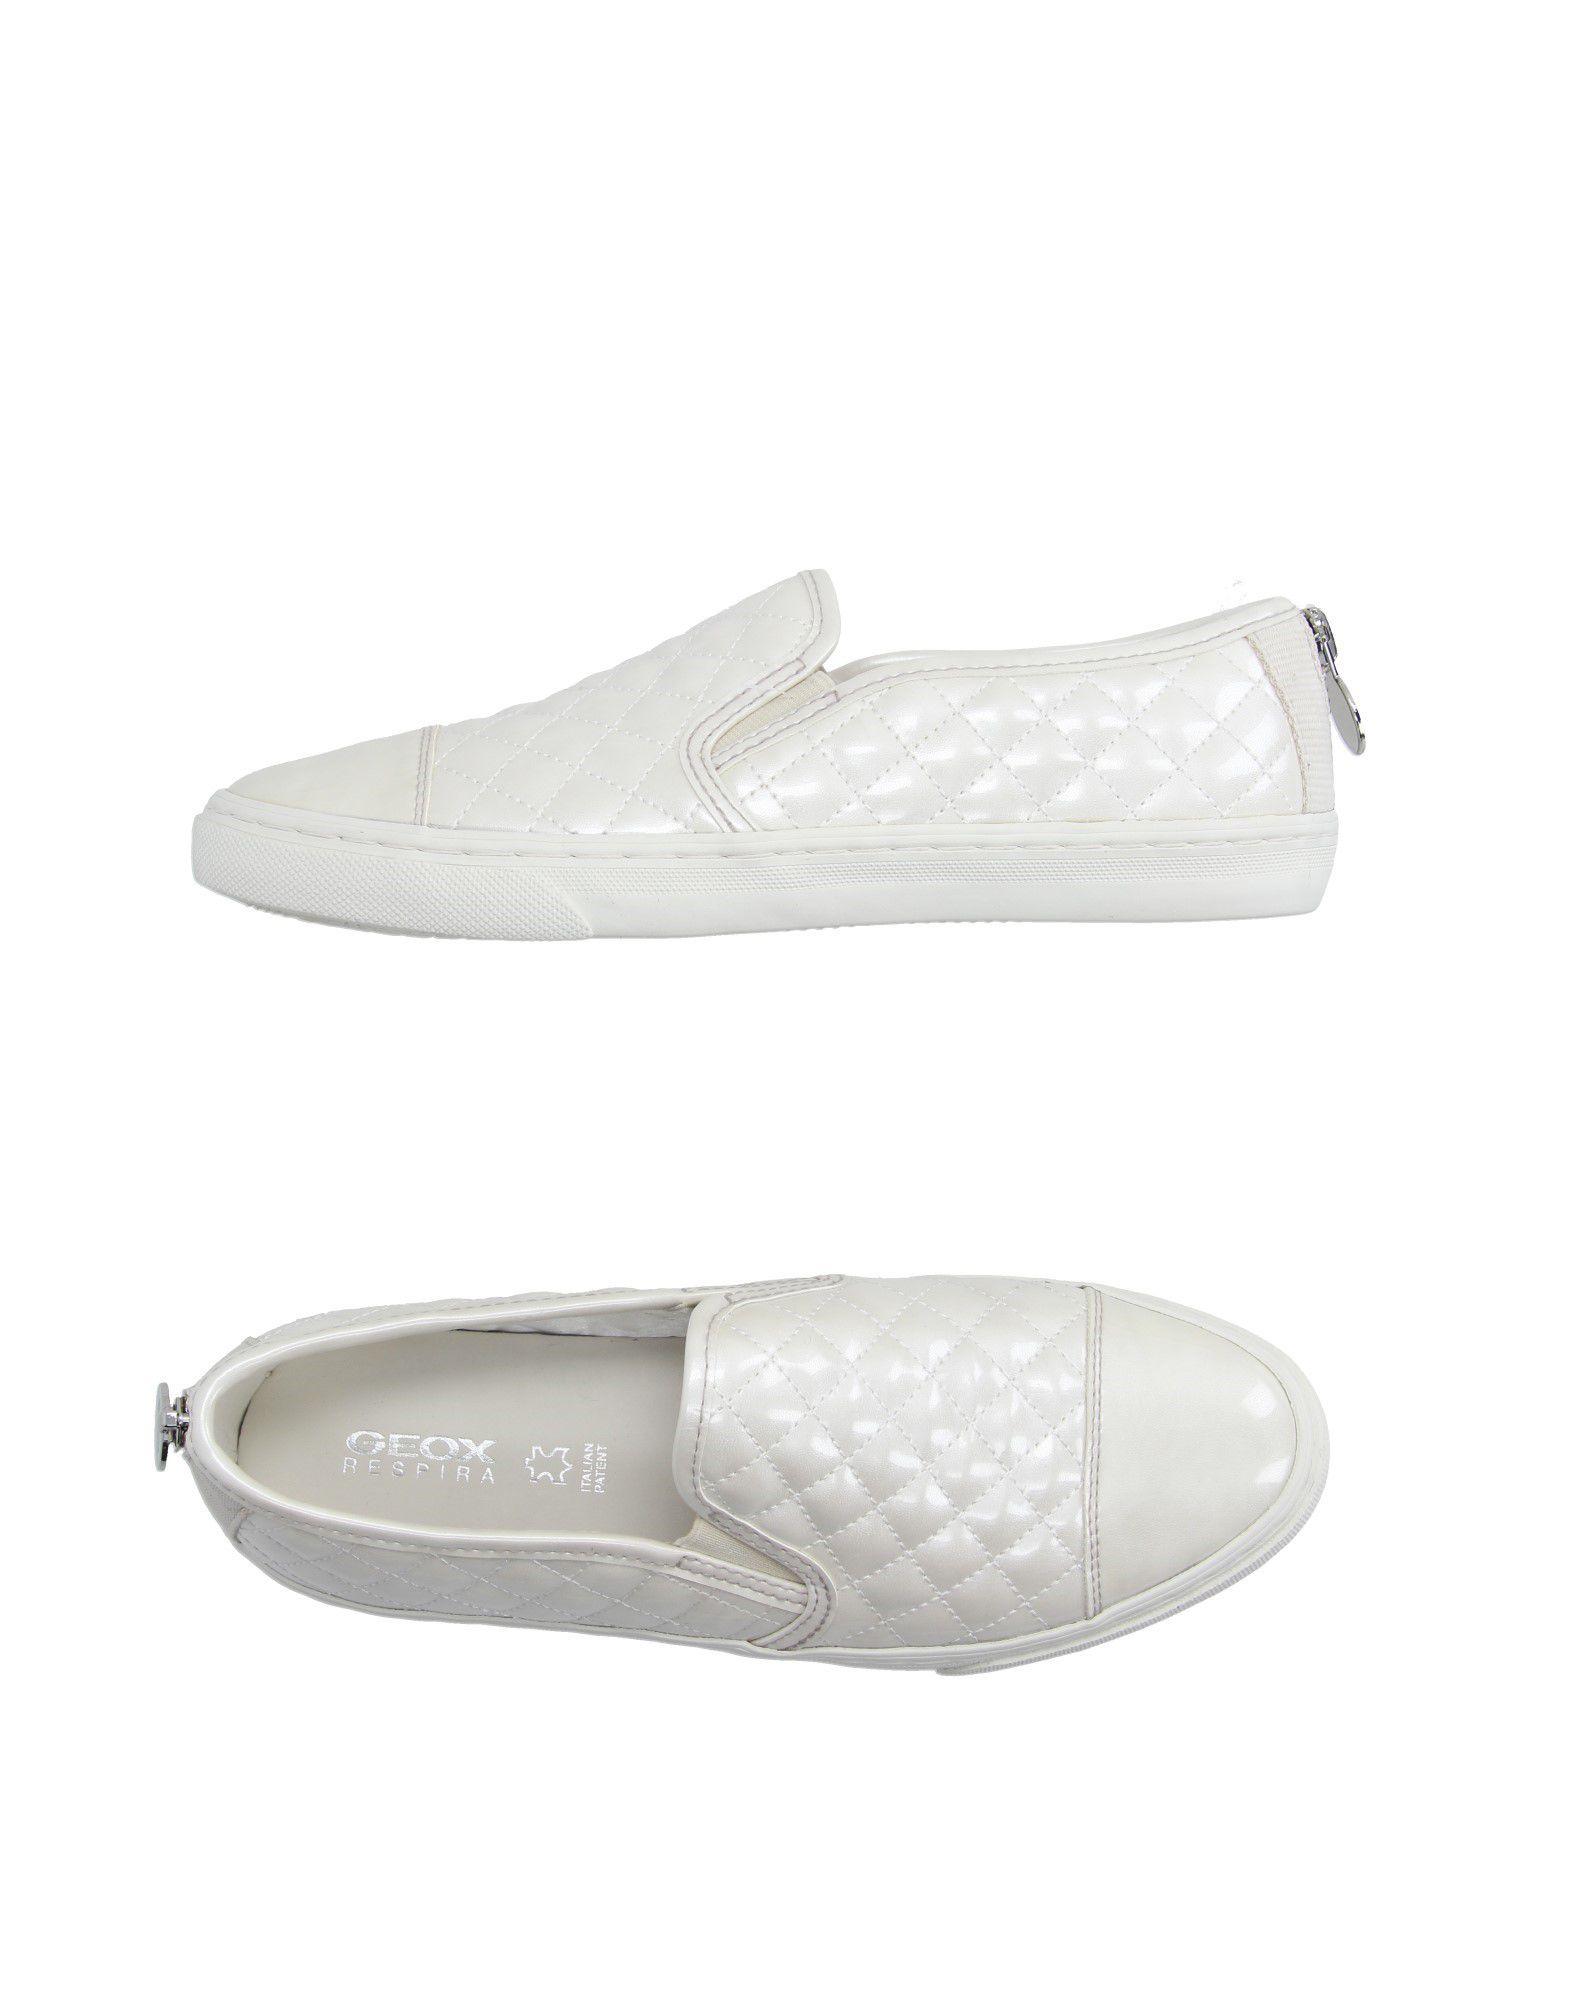 Geox Sneakers Damen  44989576KO Gute Qualität beliebte Schuhe